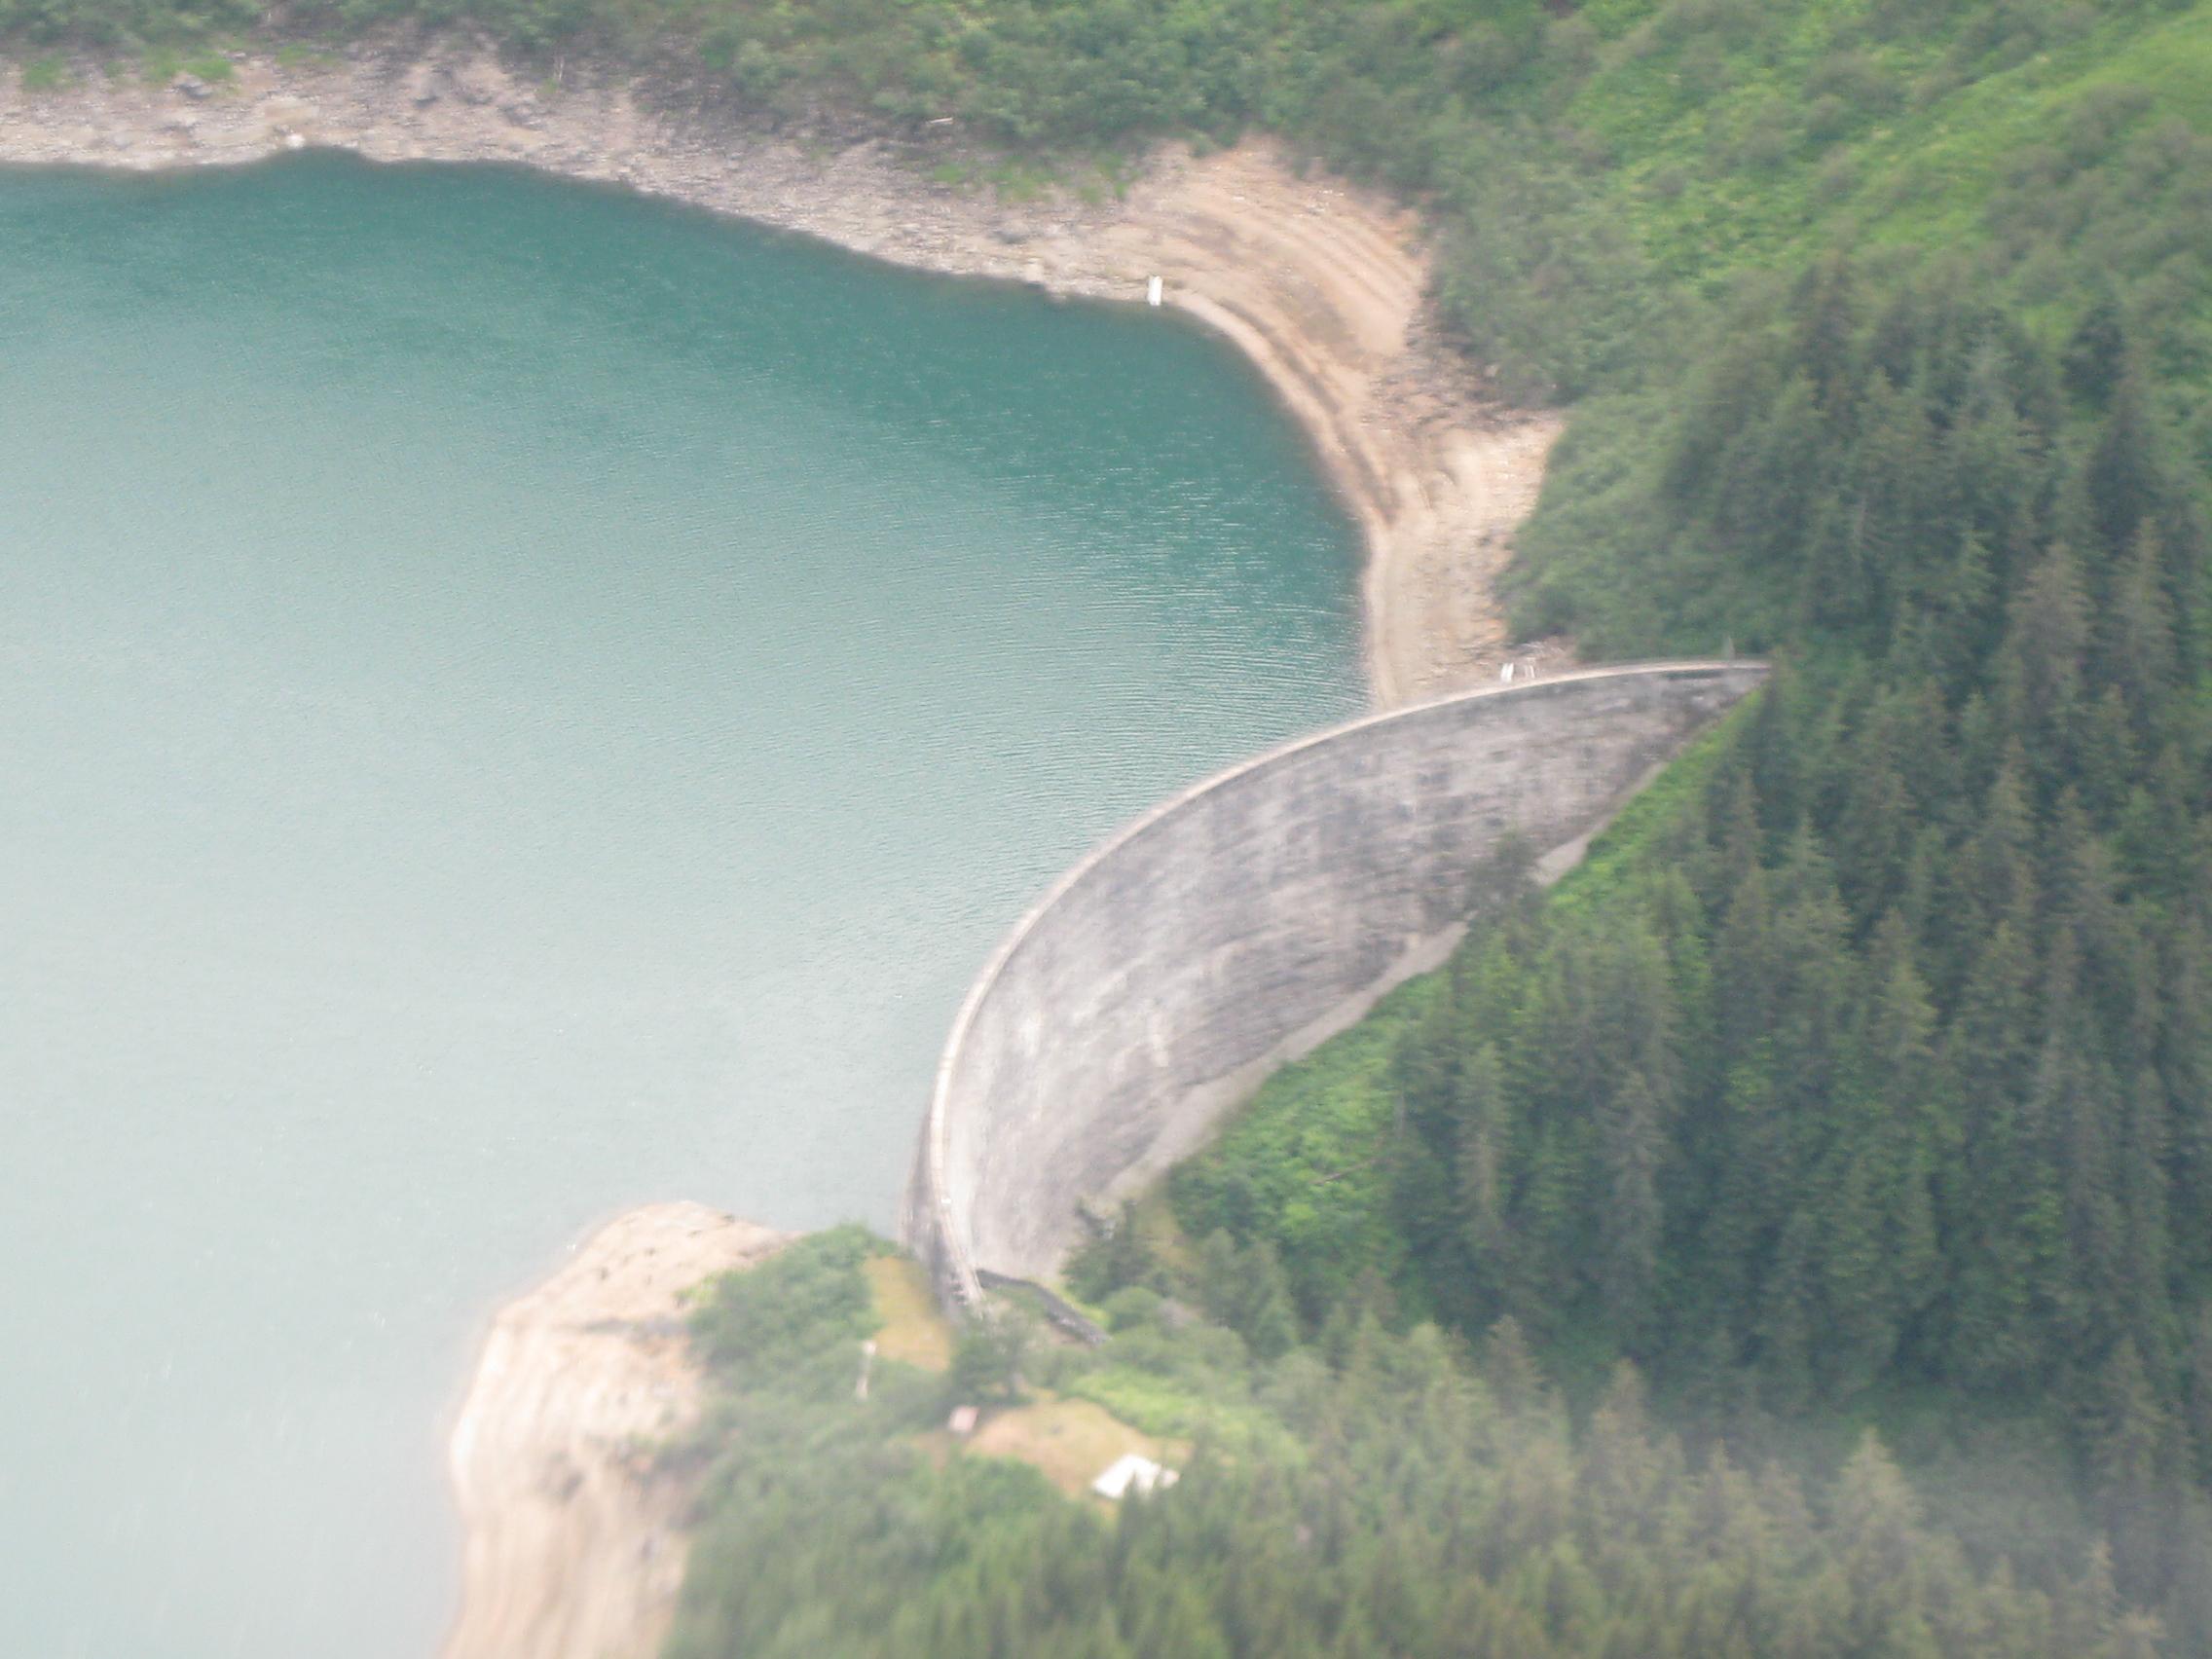 File:Close view of Arch dam.jpg - Wikipedia